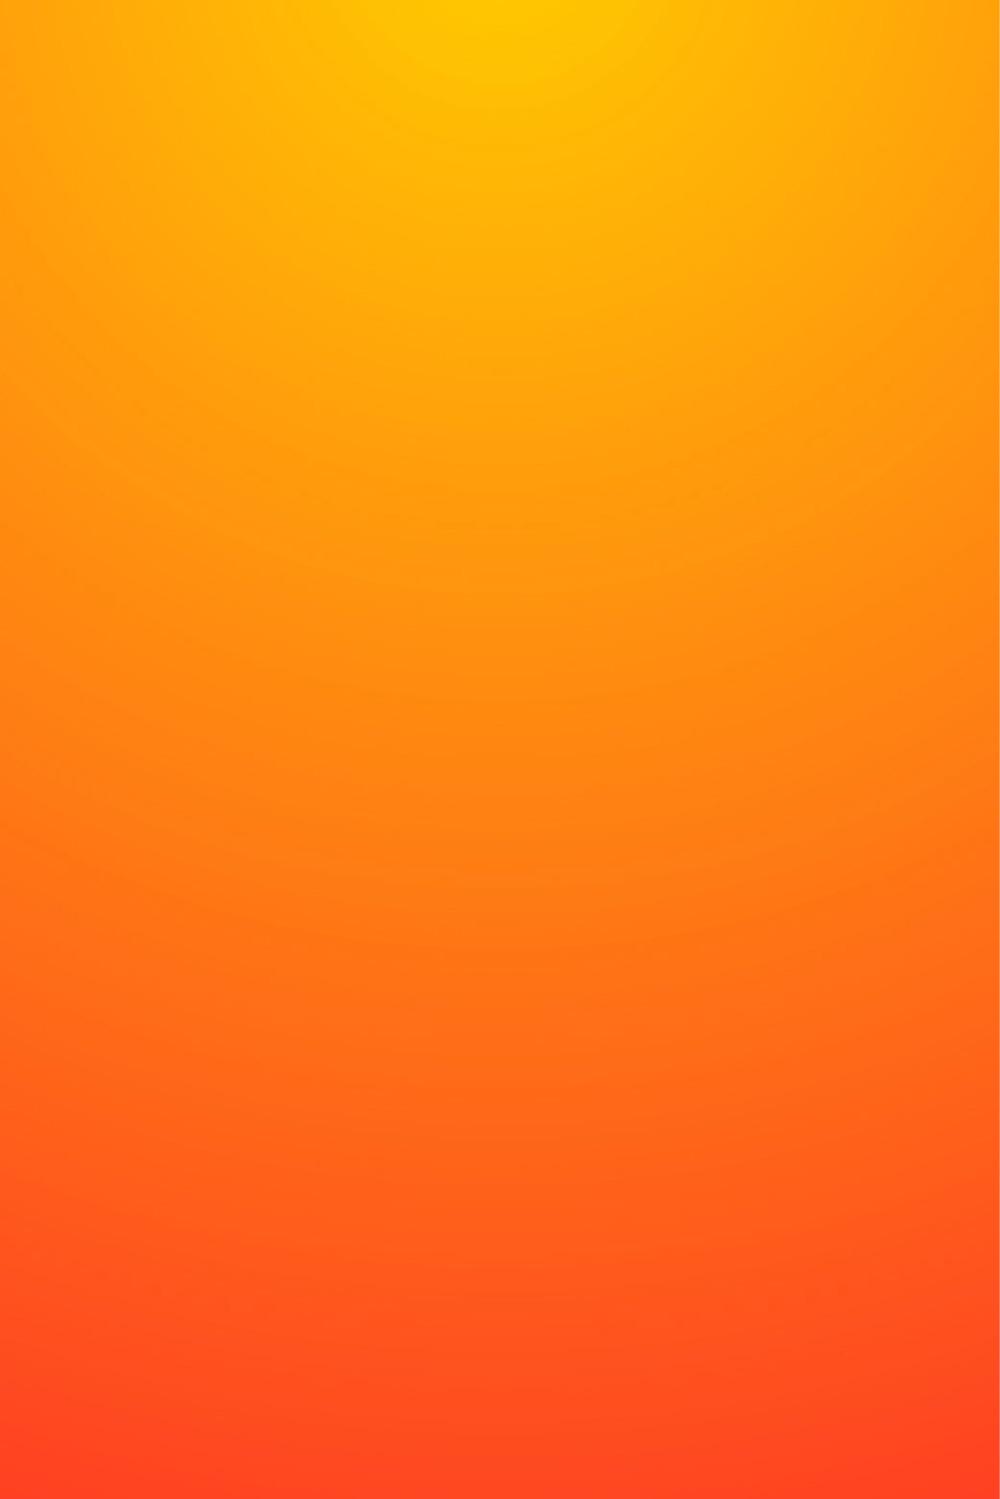 Solar_distance_4-01.jpg